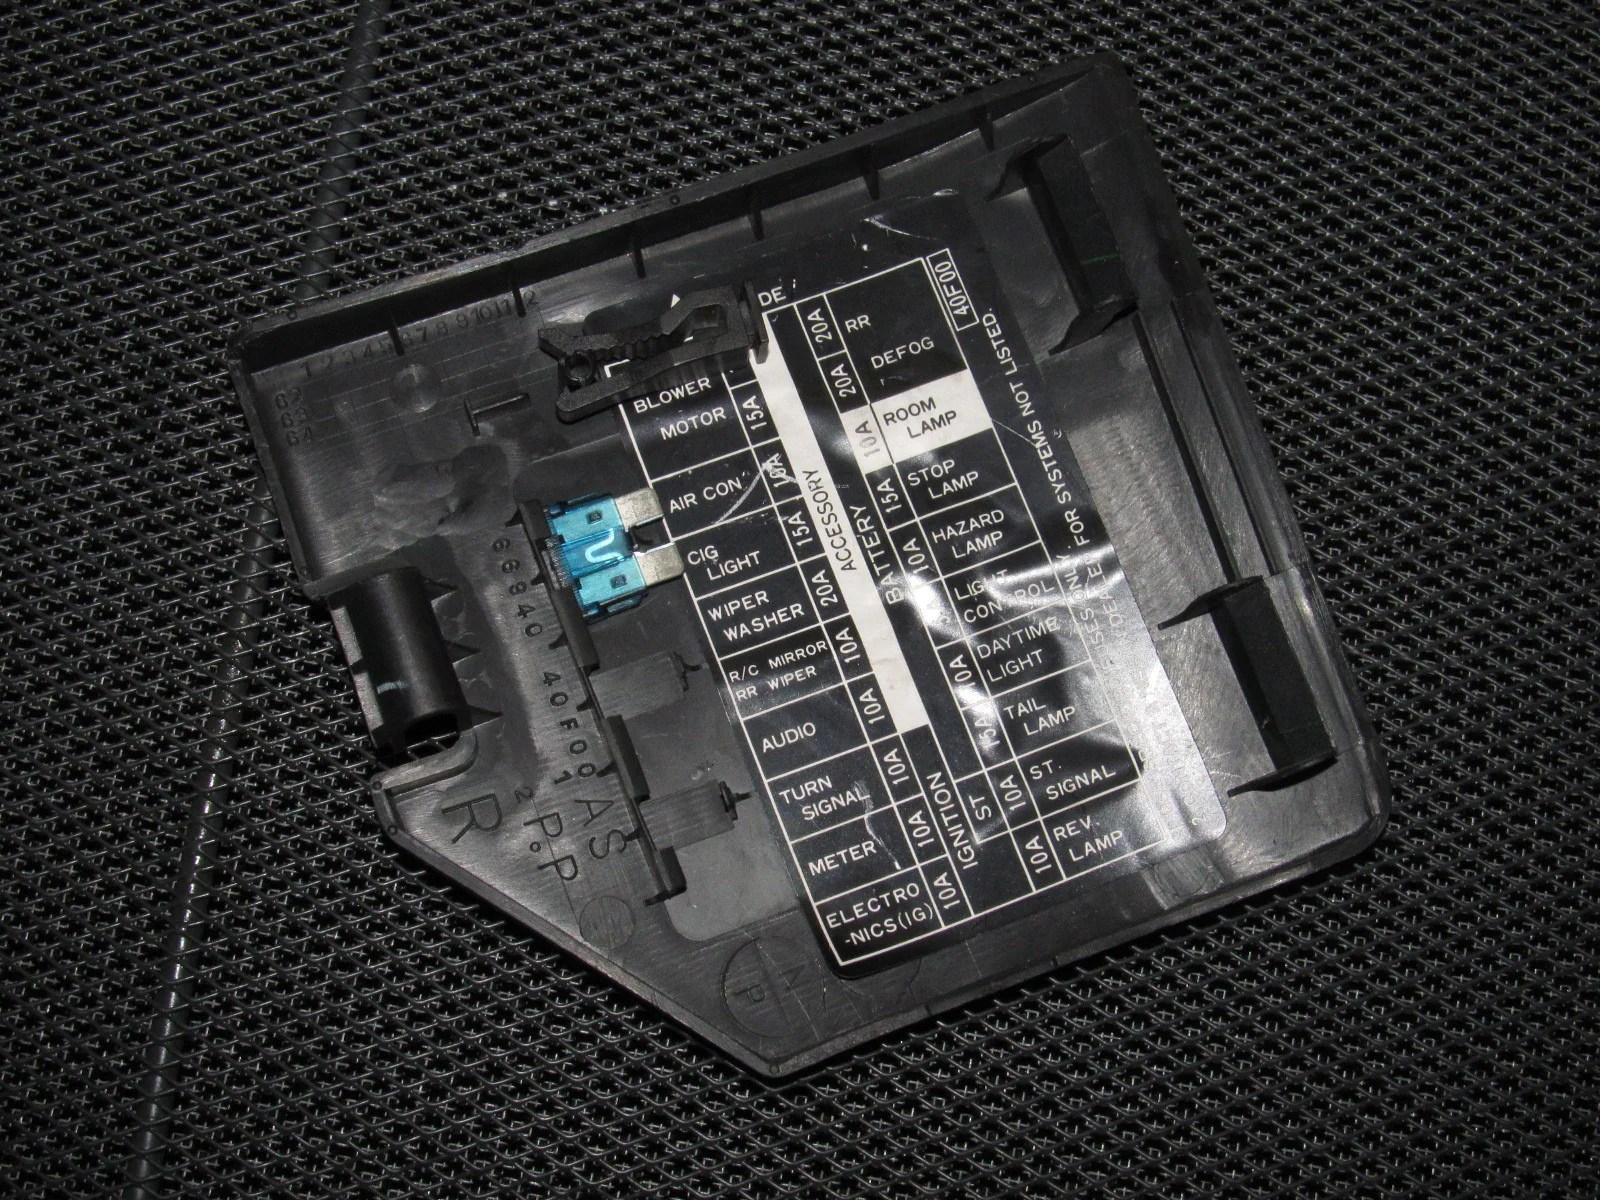 89 90 91 92 93 94 nissan 240sx oem interior fuse box cover gray 2003 nissan altima fuse box location nissan fuse box cover [ 1600 x 1200 Pixel ]